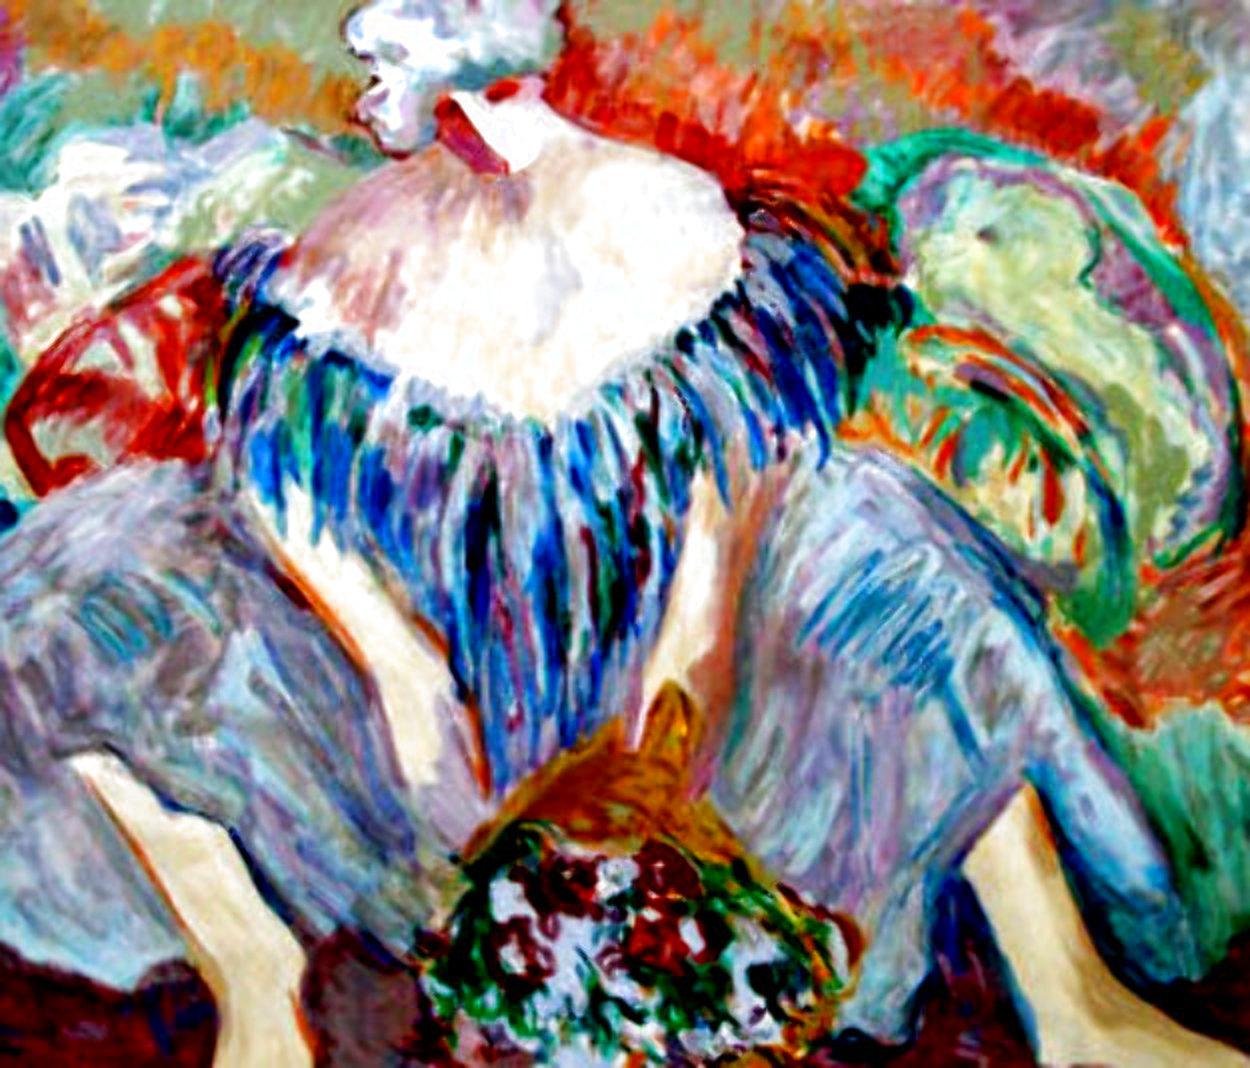 Blue Lady AP 1996 Limited Edition Print by Barbara Wood